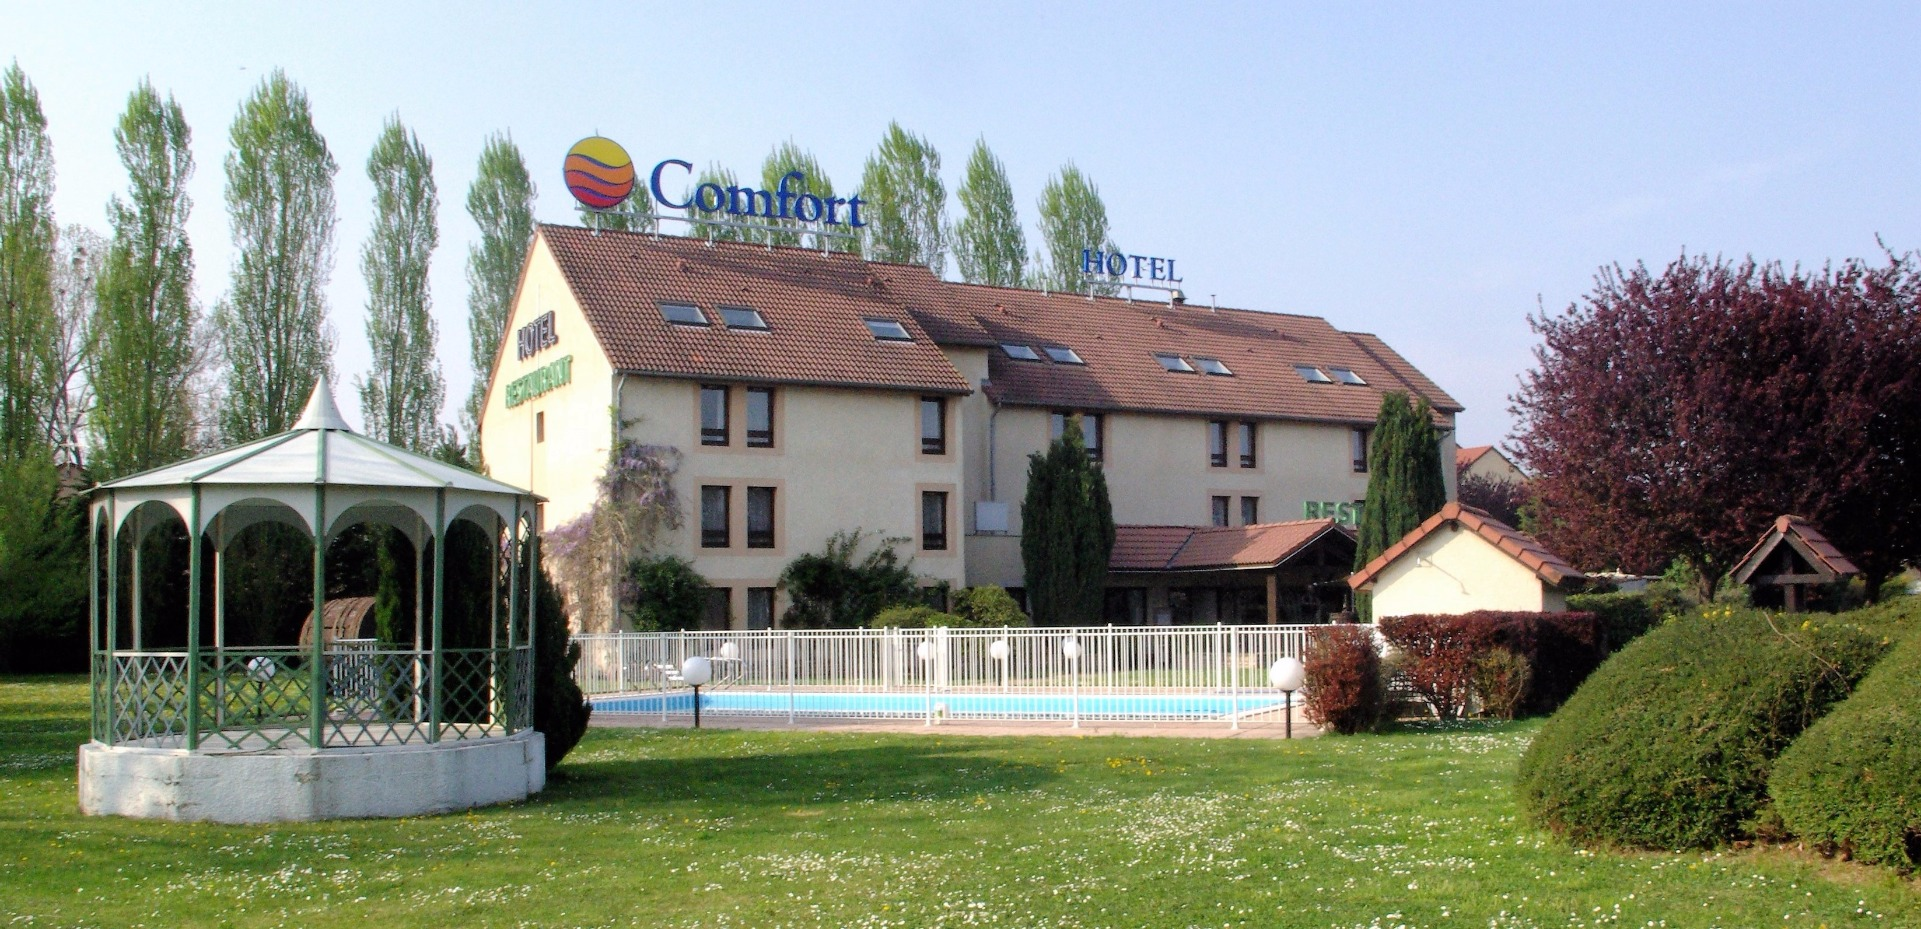 Comfort hotel beaune à Beaune